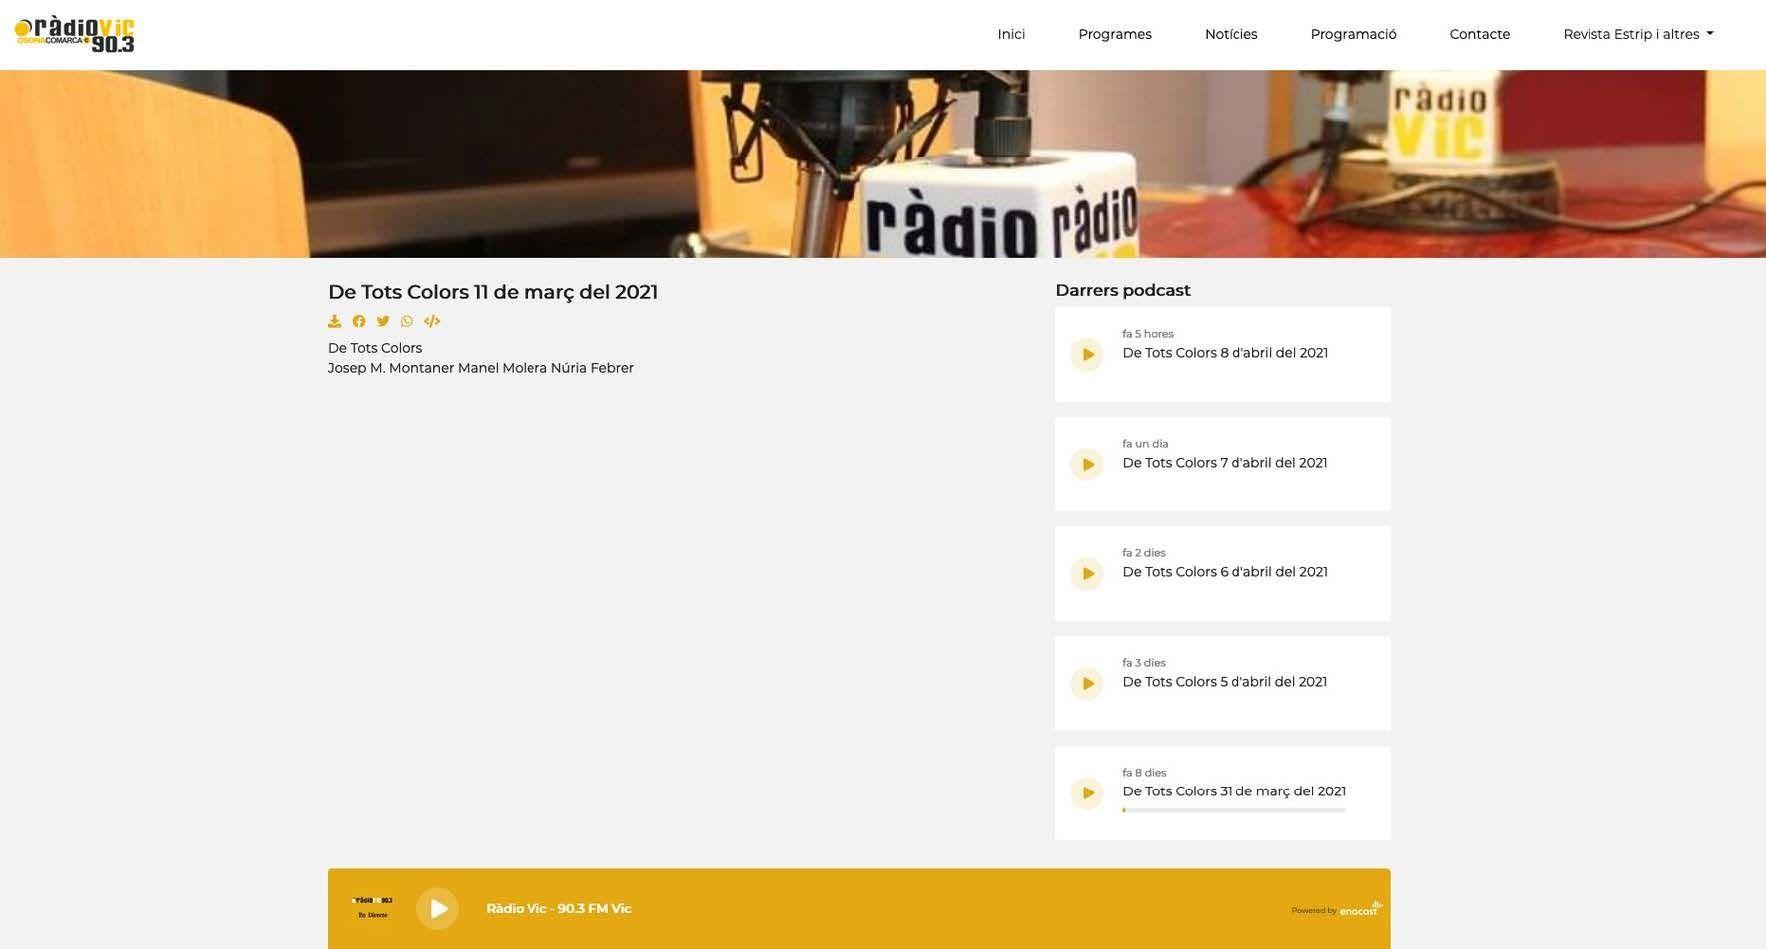 11.03.2021 radiovic